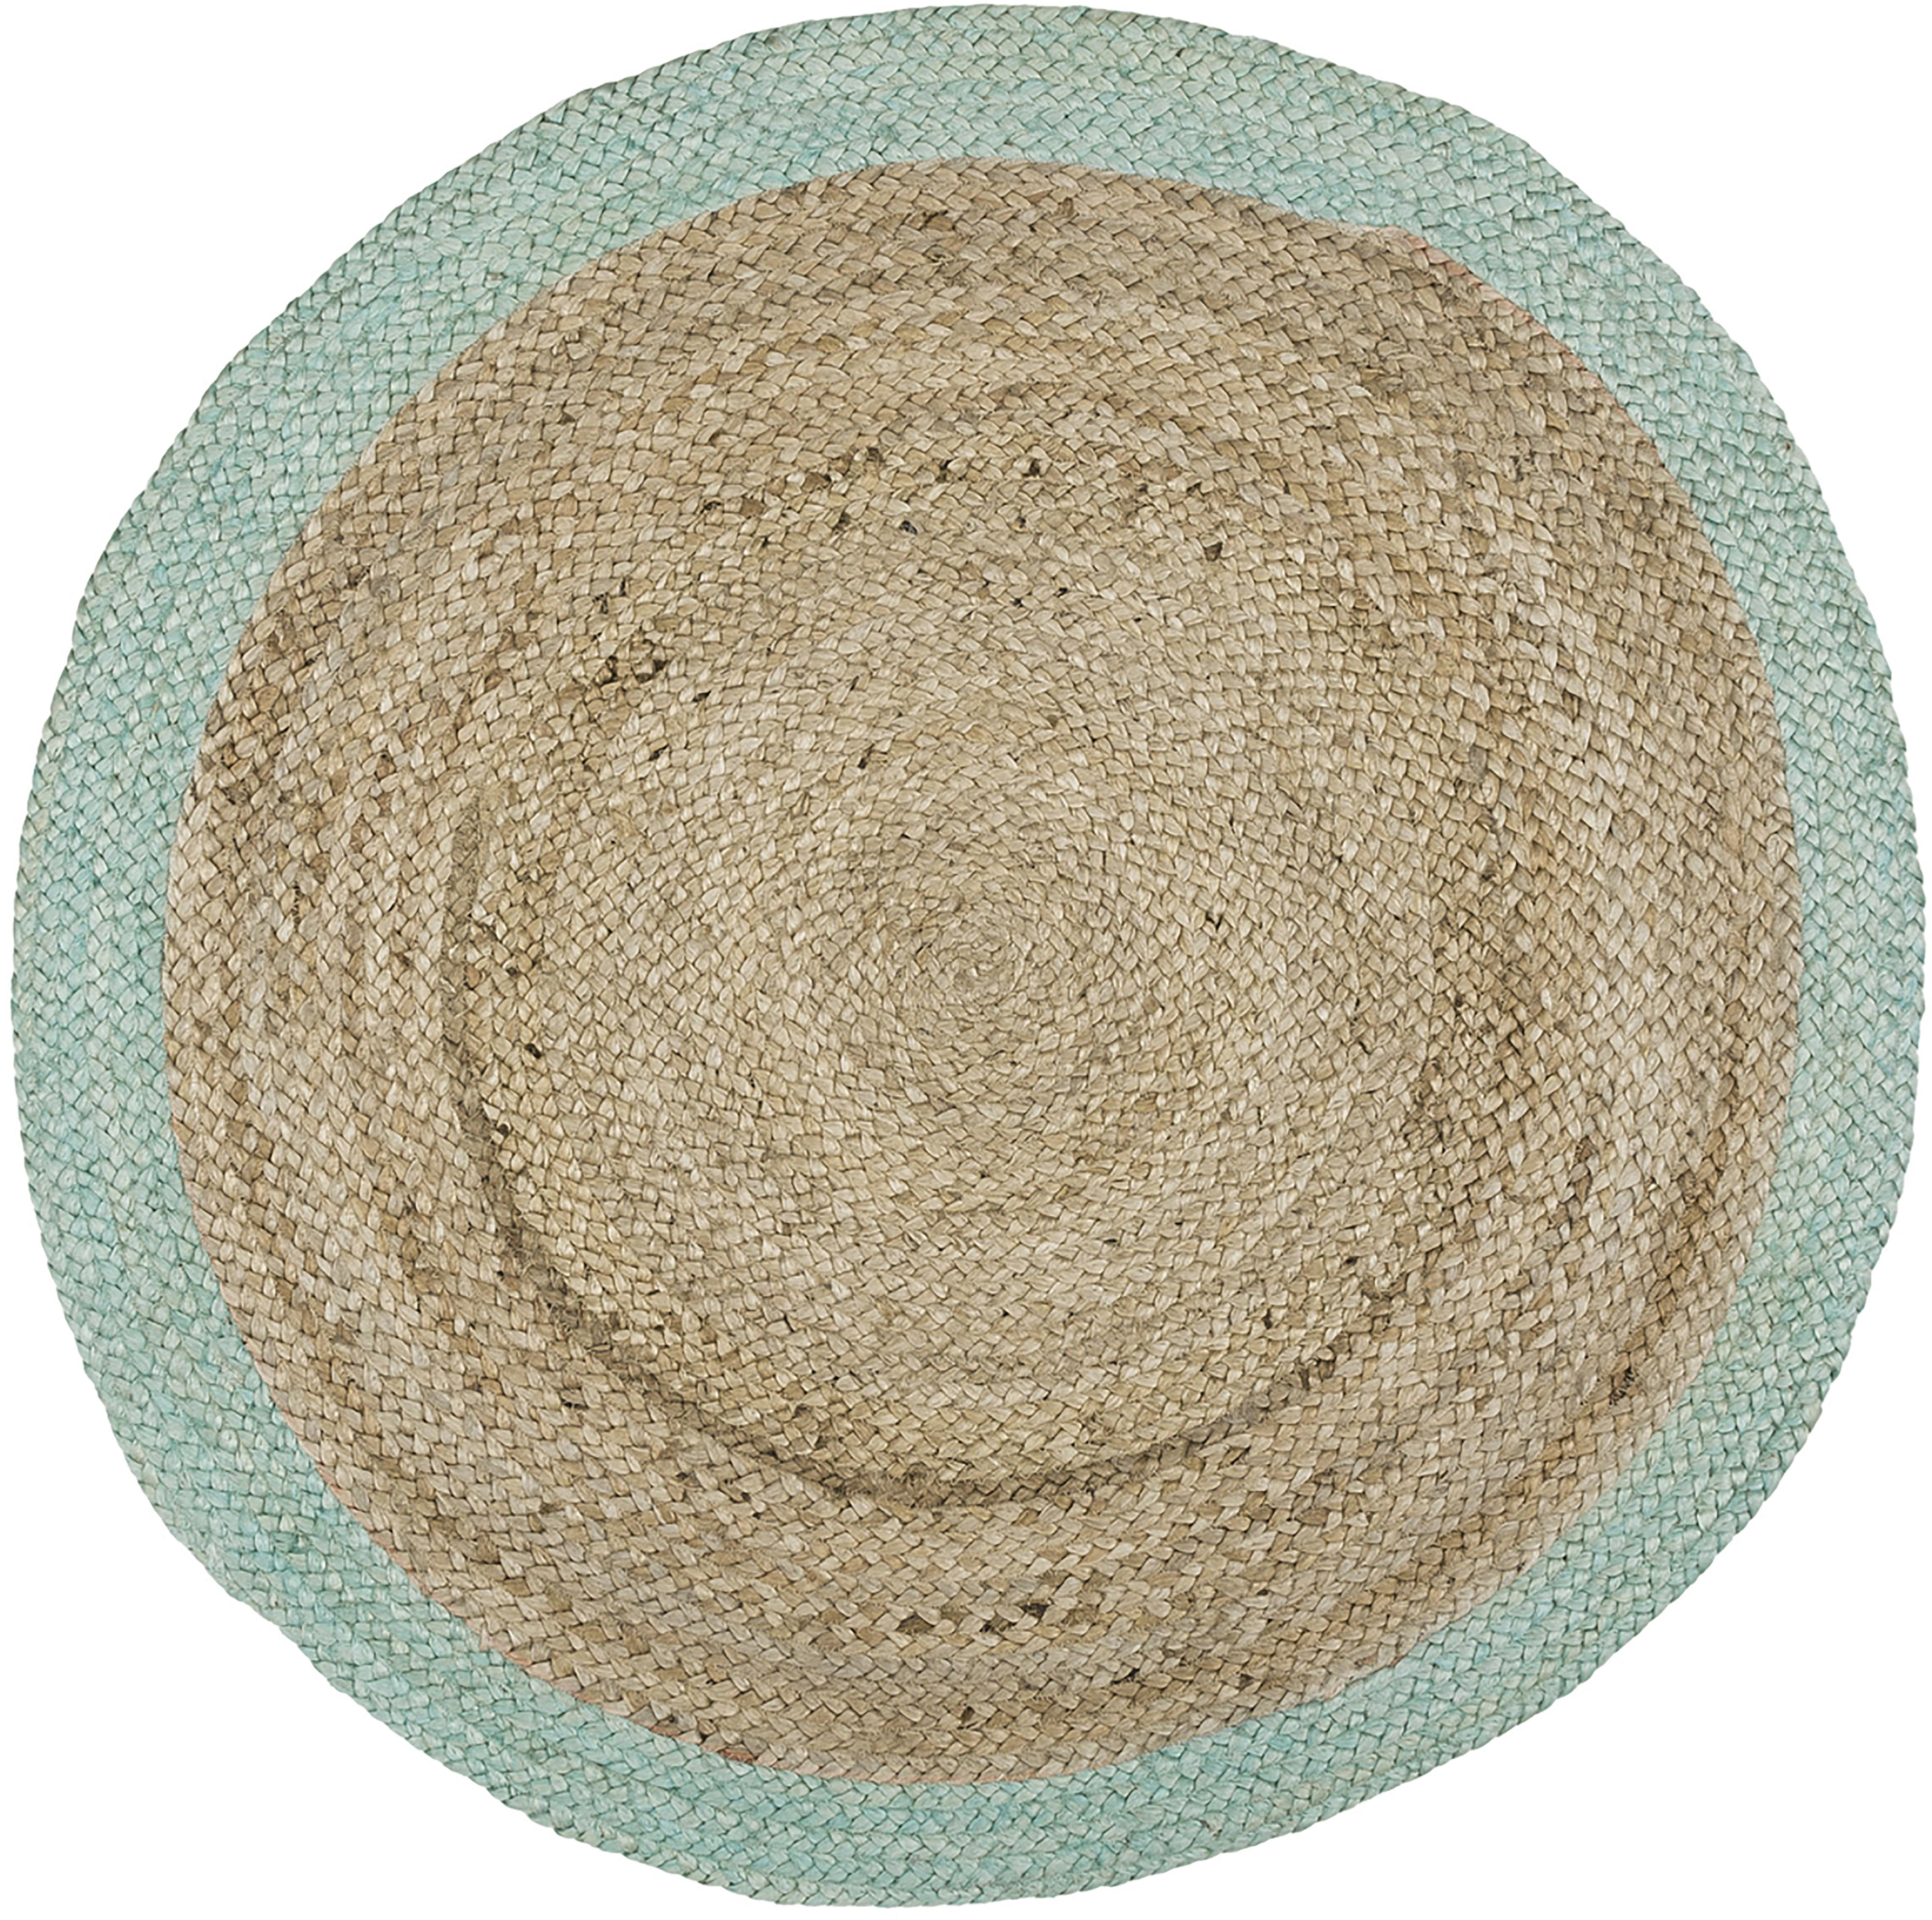 Runder Jute-Teppich Shanta mit mintgrünem Rand, handgefertigt, Jute, Mintgrün, Ø 100 cm (Grösse XS)